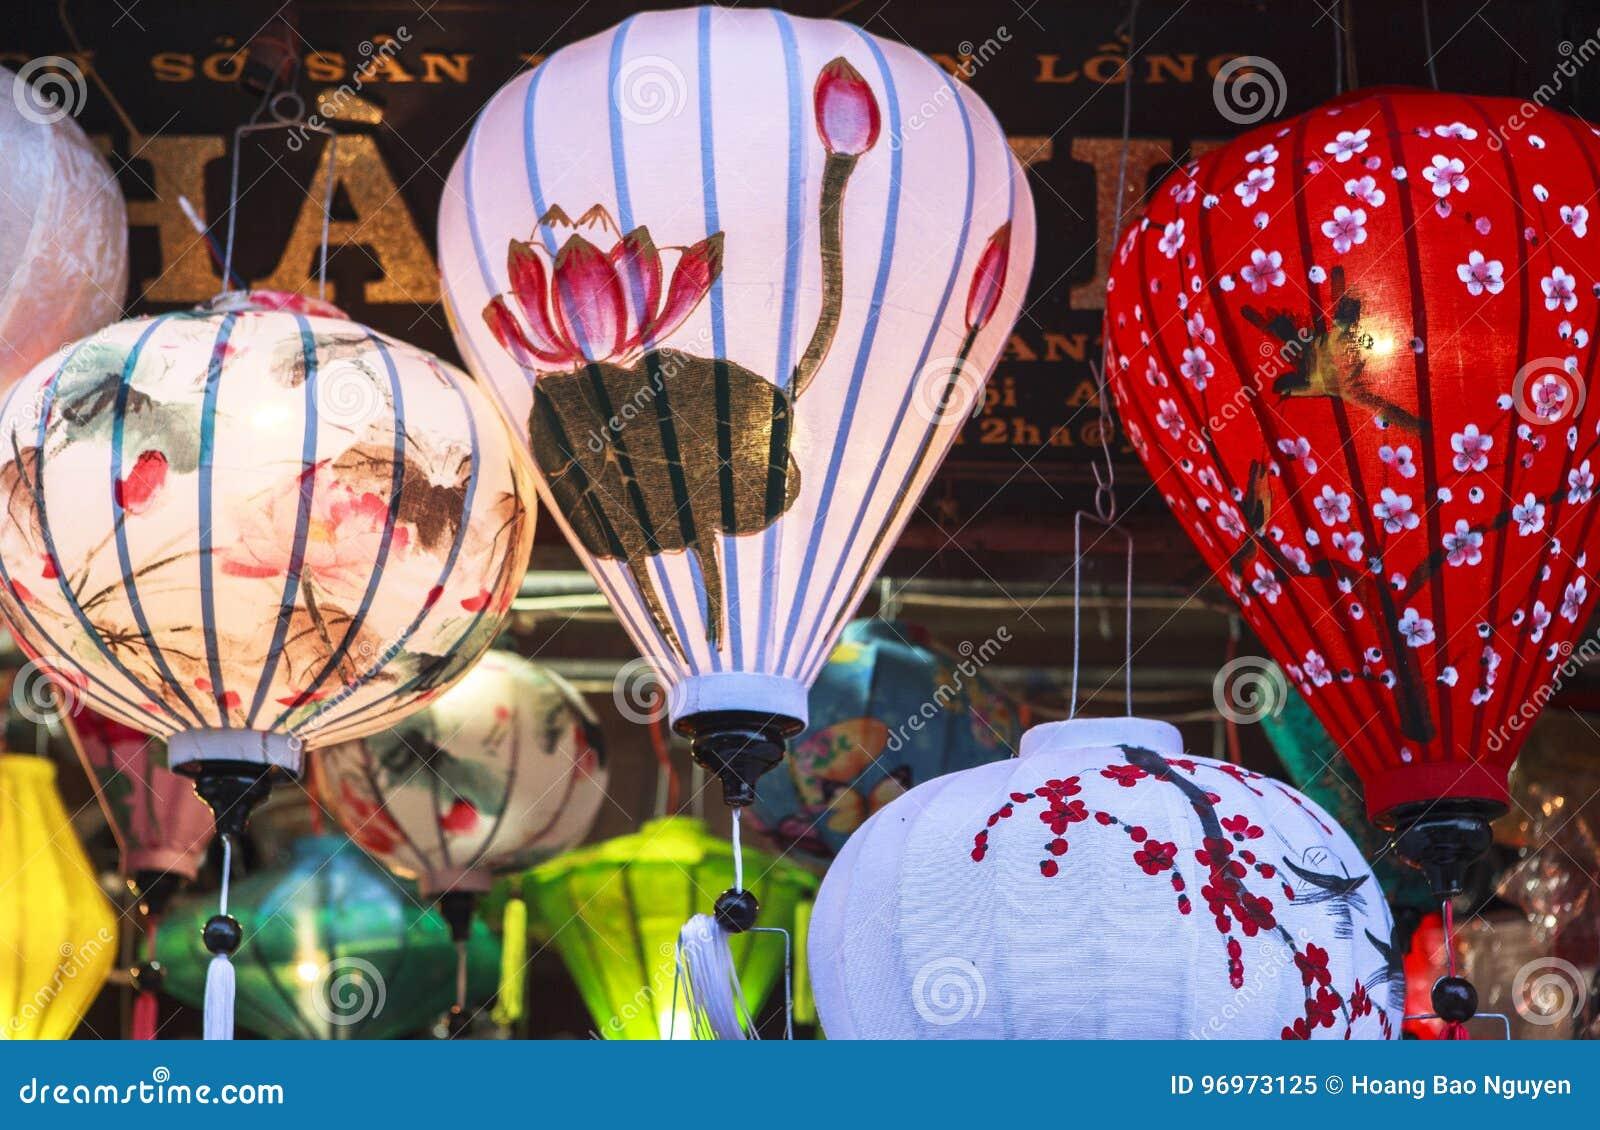 Lanterns In Old Street Hoi An, Vietnam Stock Image - Image